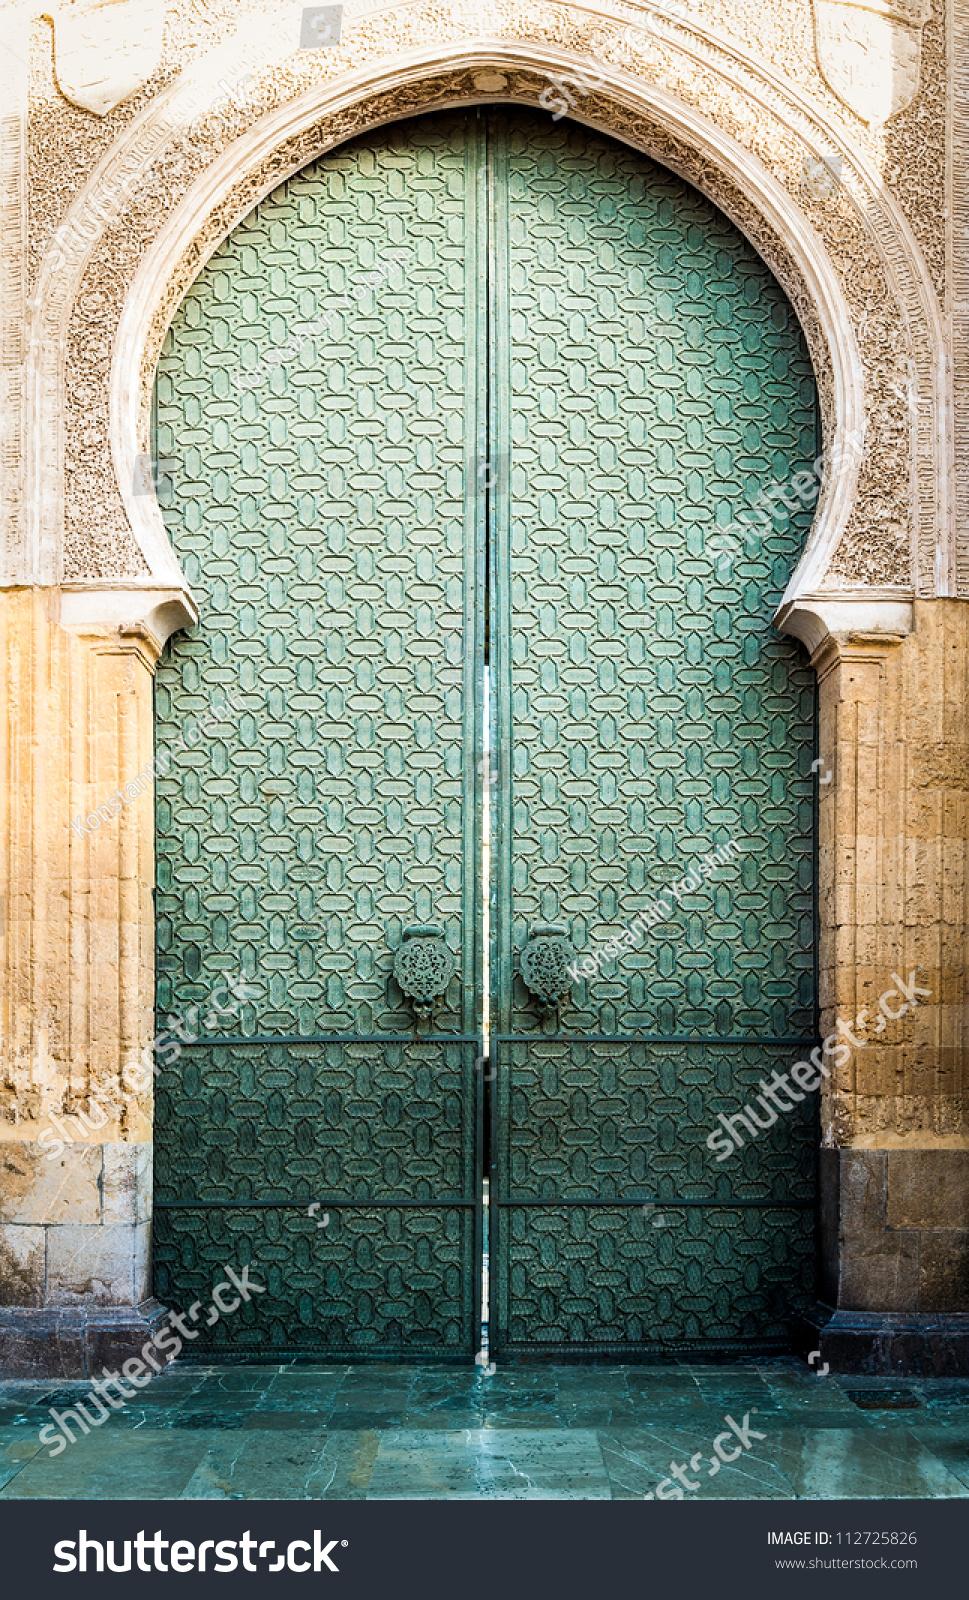 Famous Landmark Spain Beautiful Cathedral Mezquita Stock